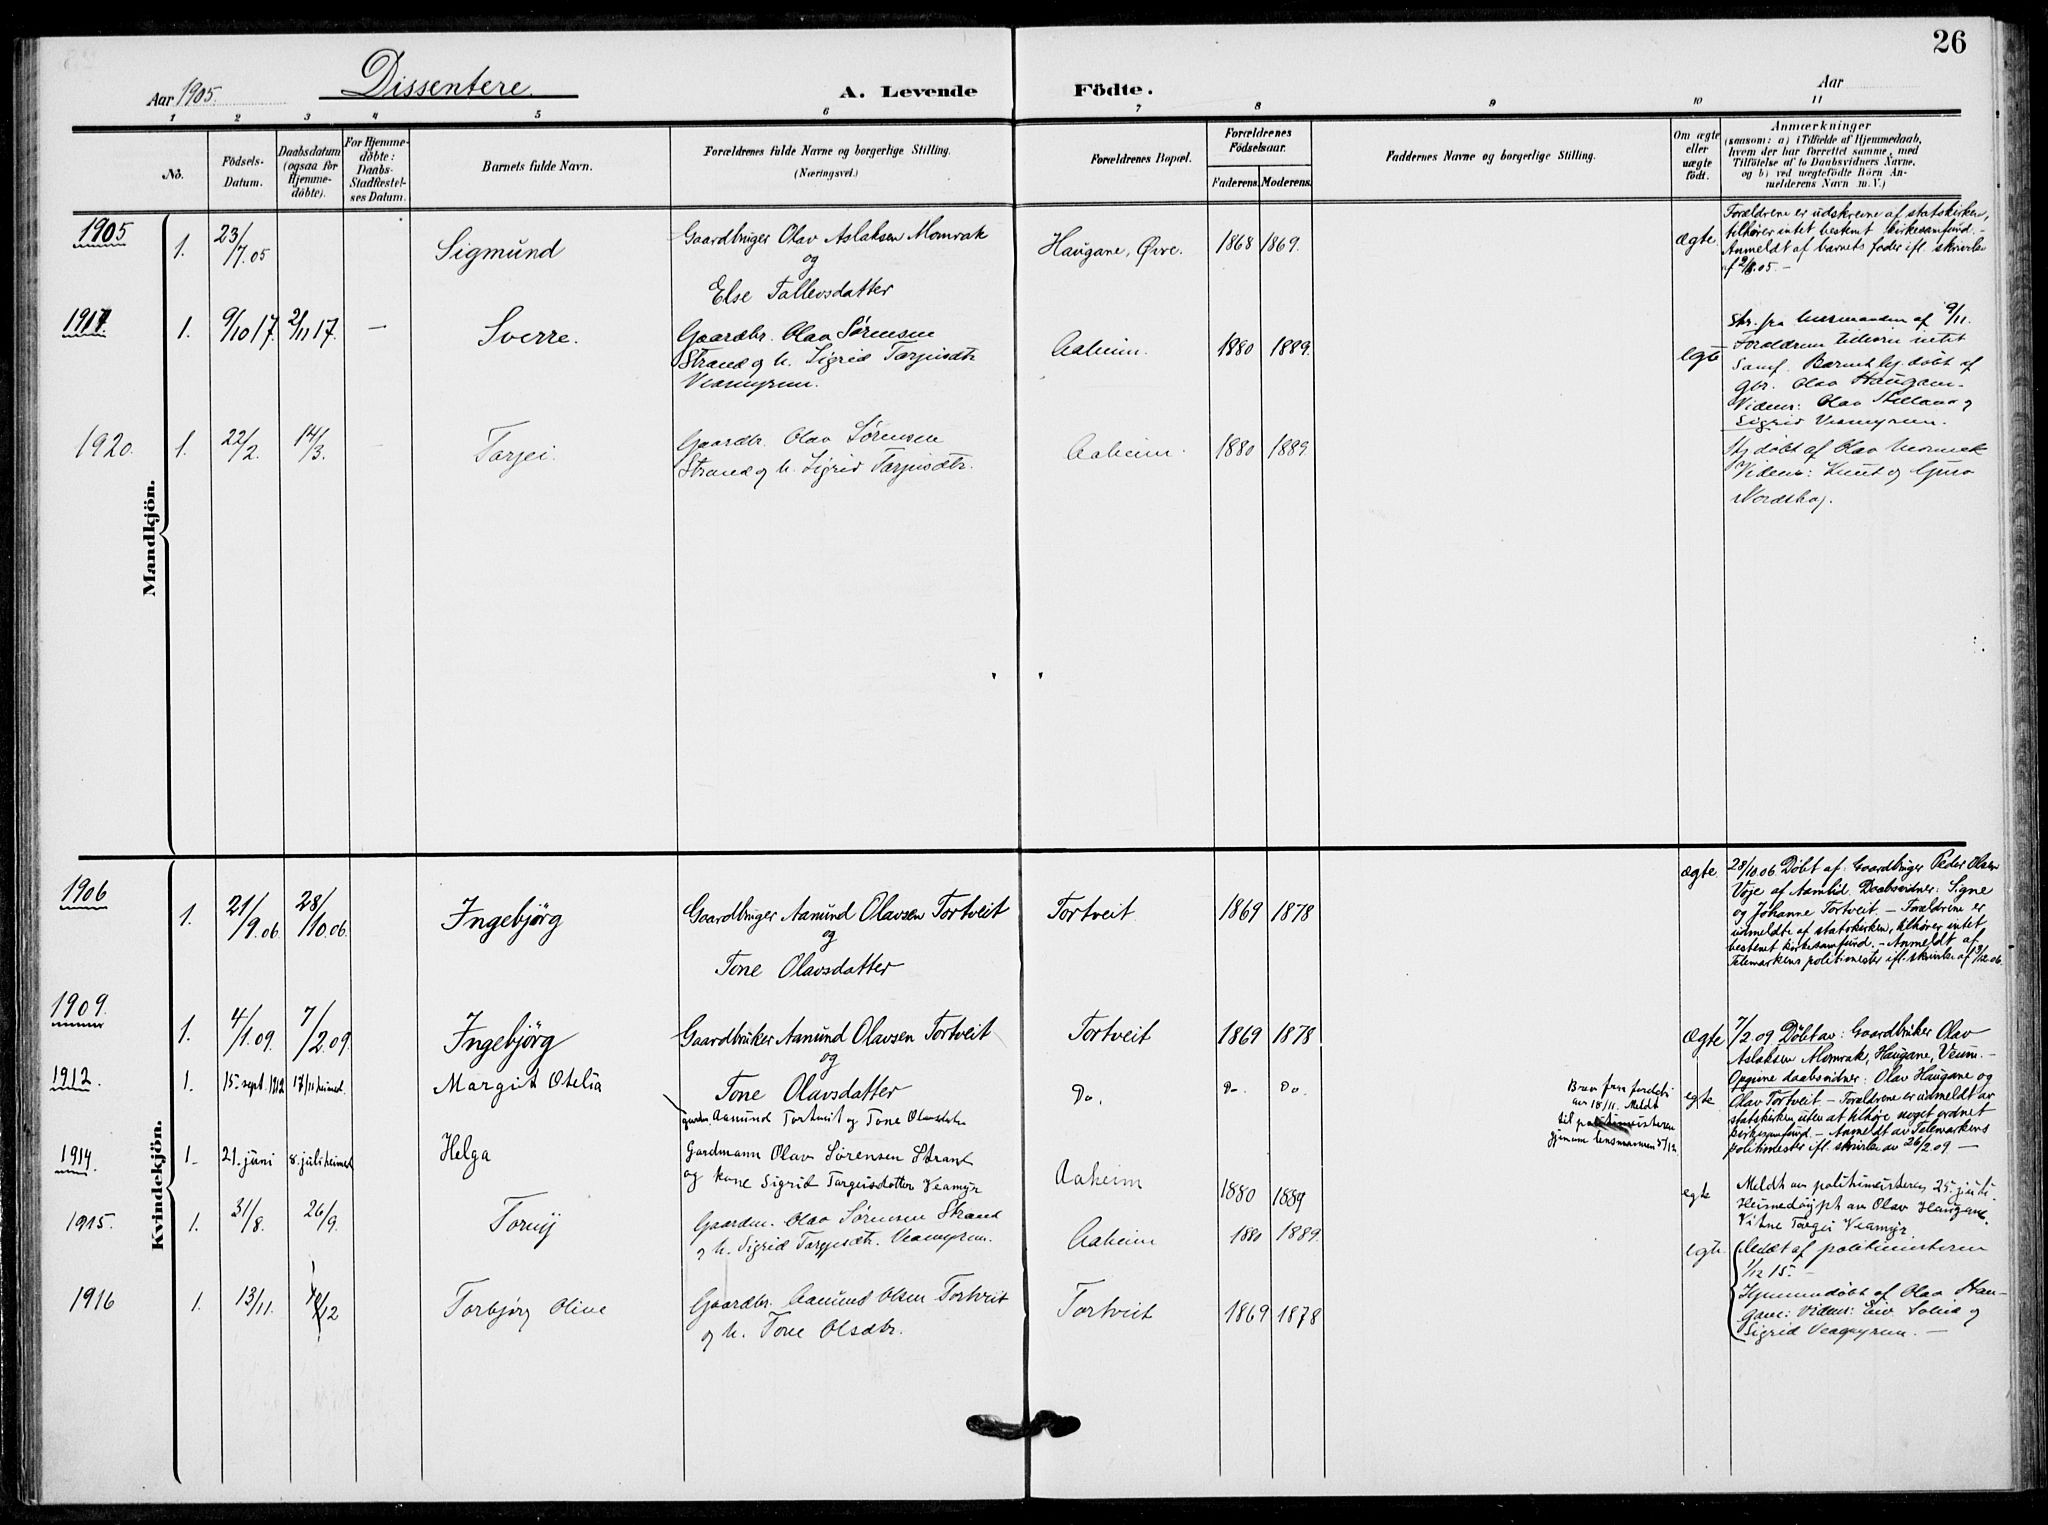 SAKO, Fyresdal kirkebøker, F/Fb/L0004: Ministerialbok nr. II 4, 1903-1920, s. 26